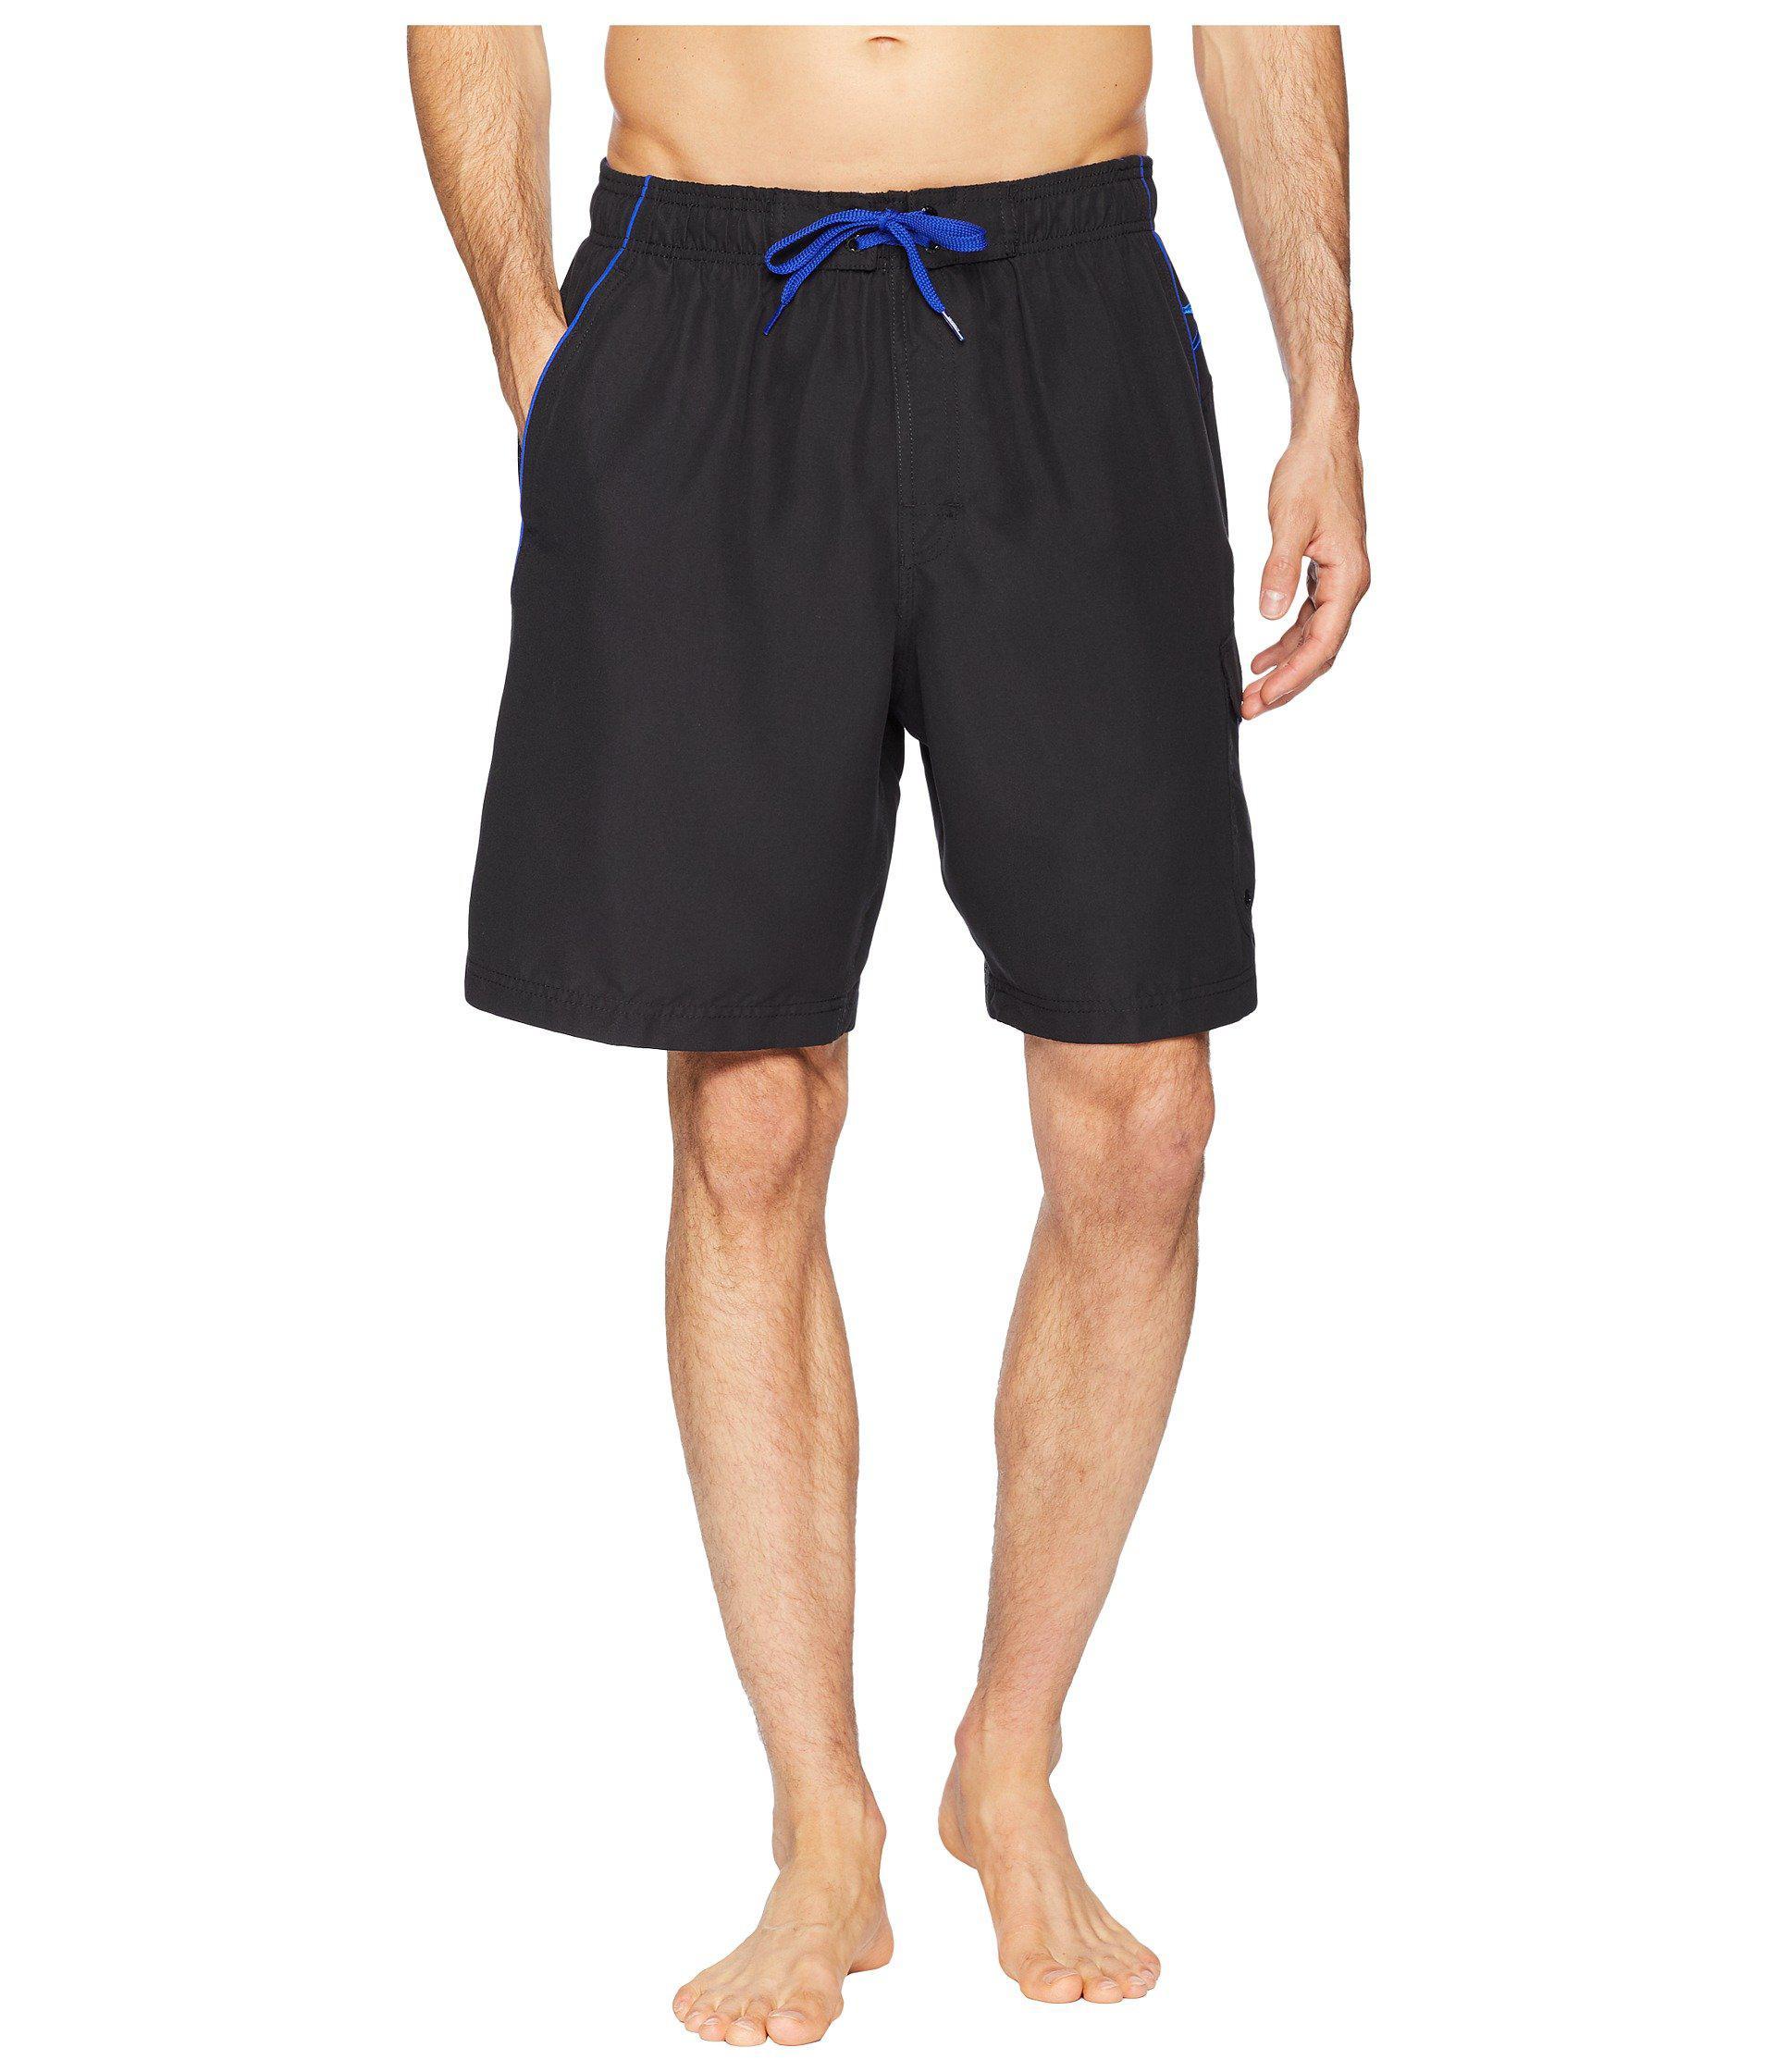 237cc53224 Speedo Marina Volley Swim Trunk (grey/blue) Men's Swimwear in Blue ...